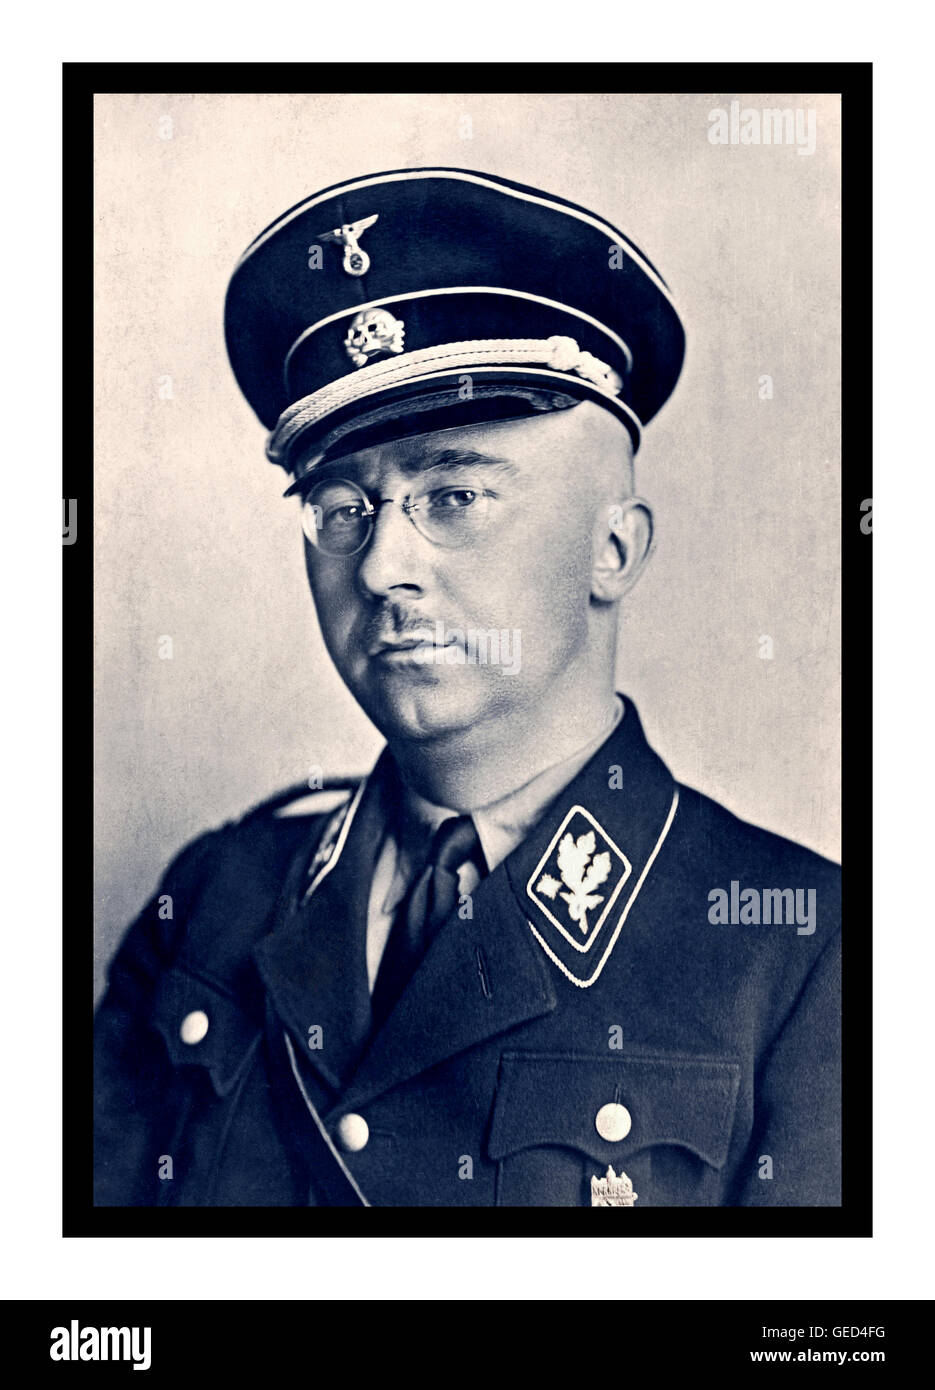 c06bf672de85f Heinrich Himmler formal portrait in Waffen SS uniform RGB B&W split-tone  German National Socialist